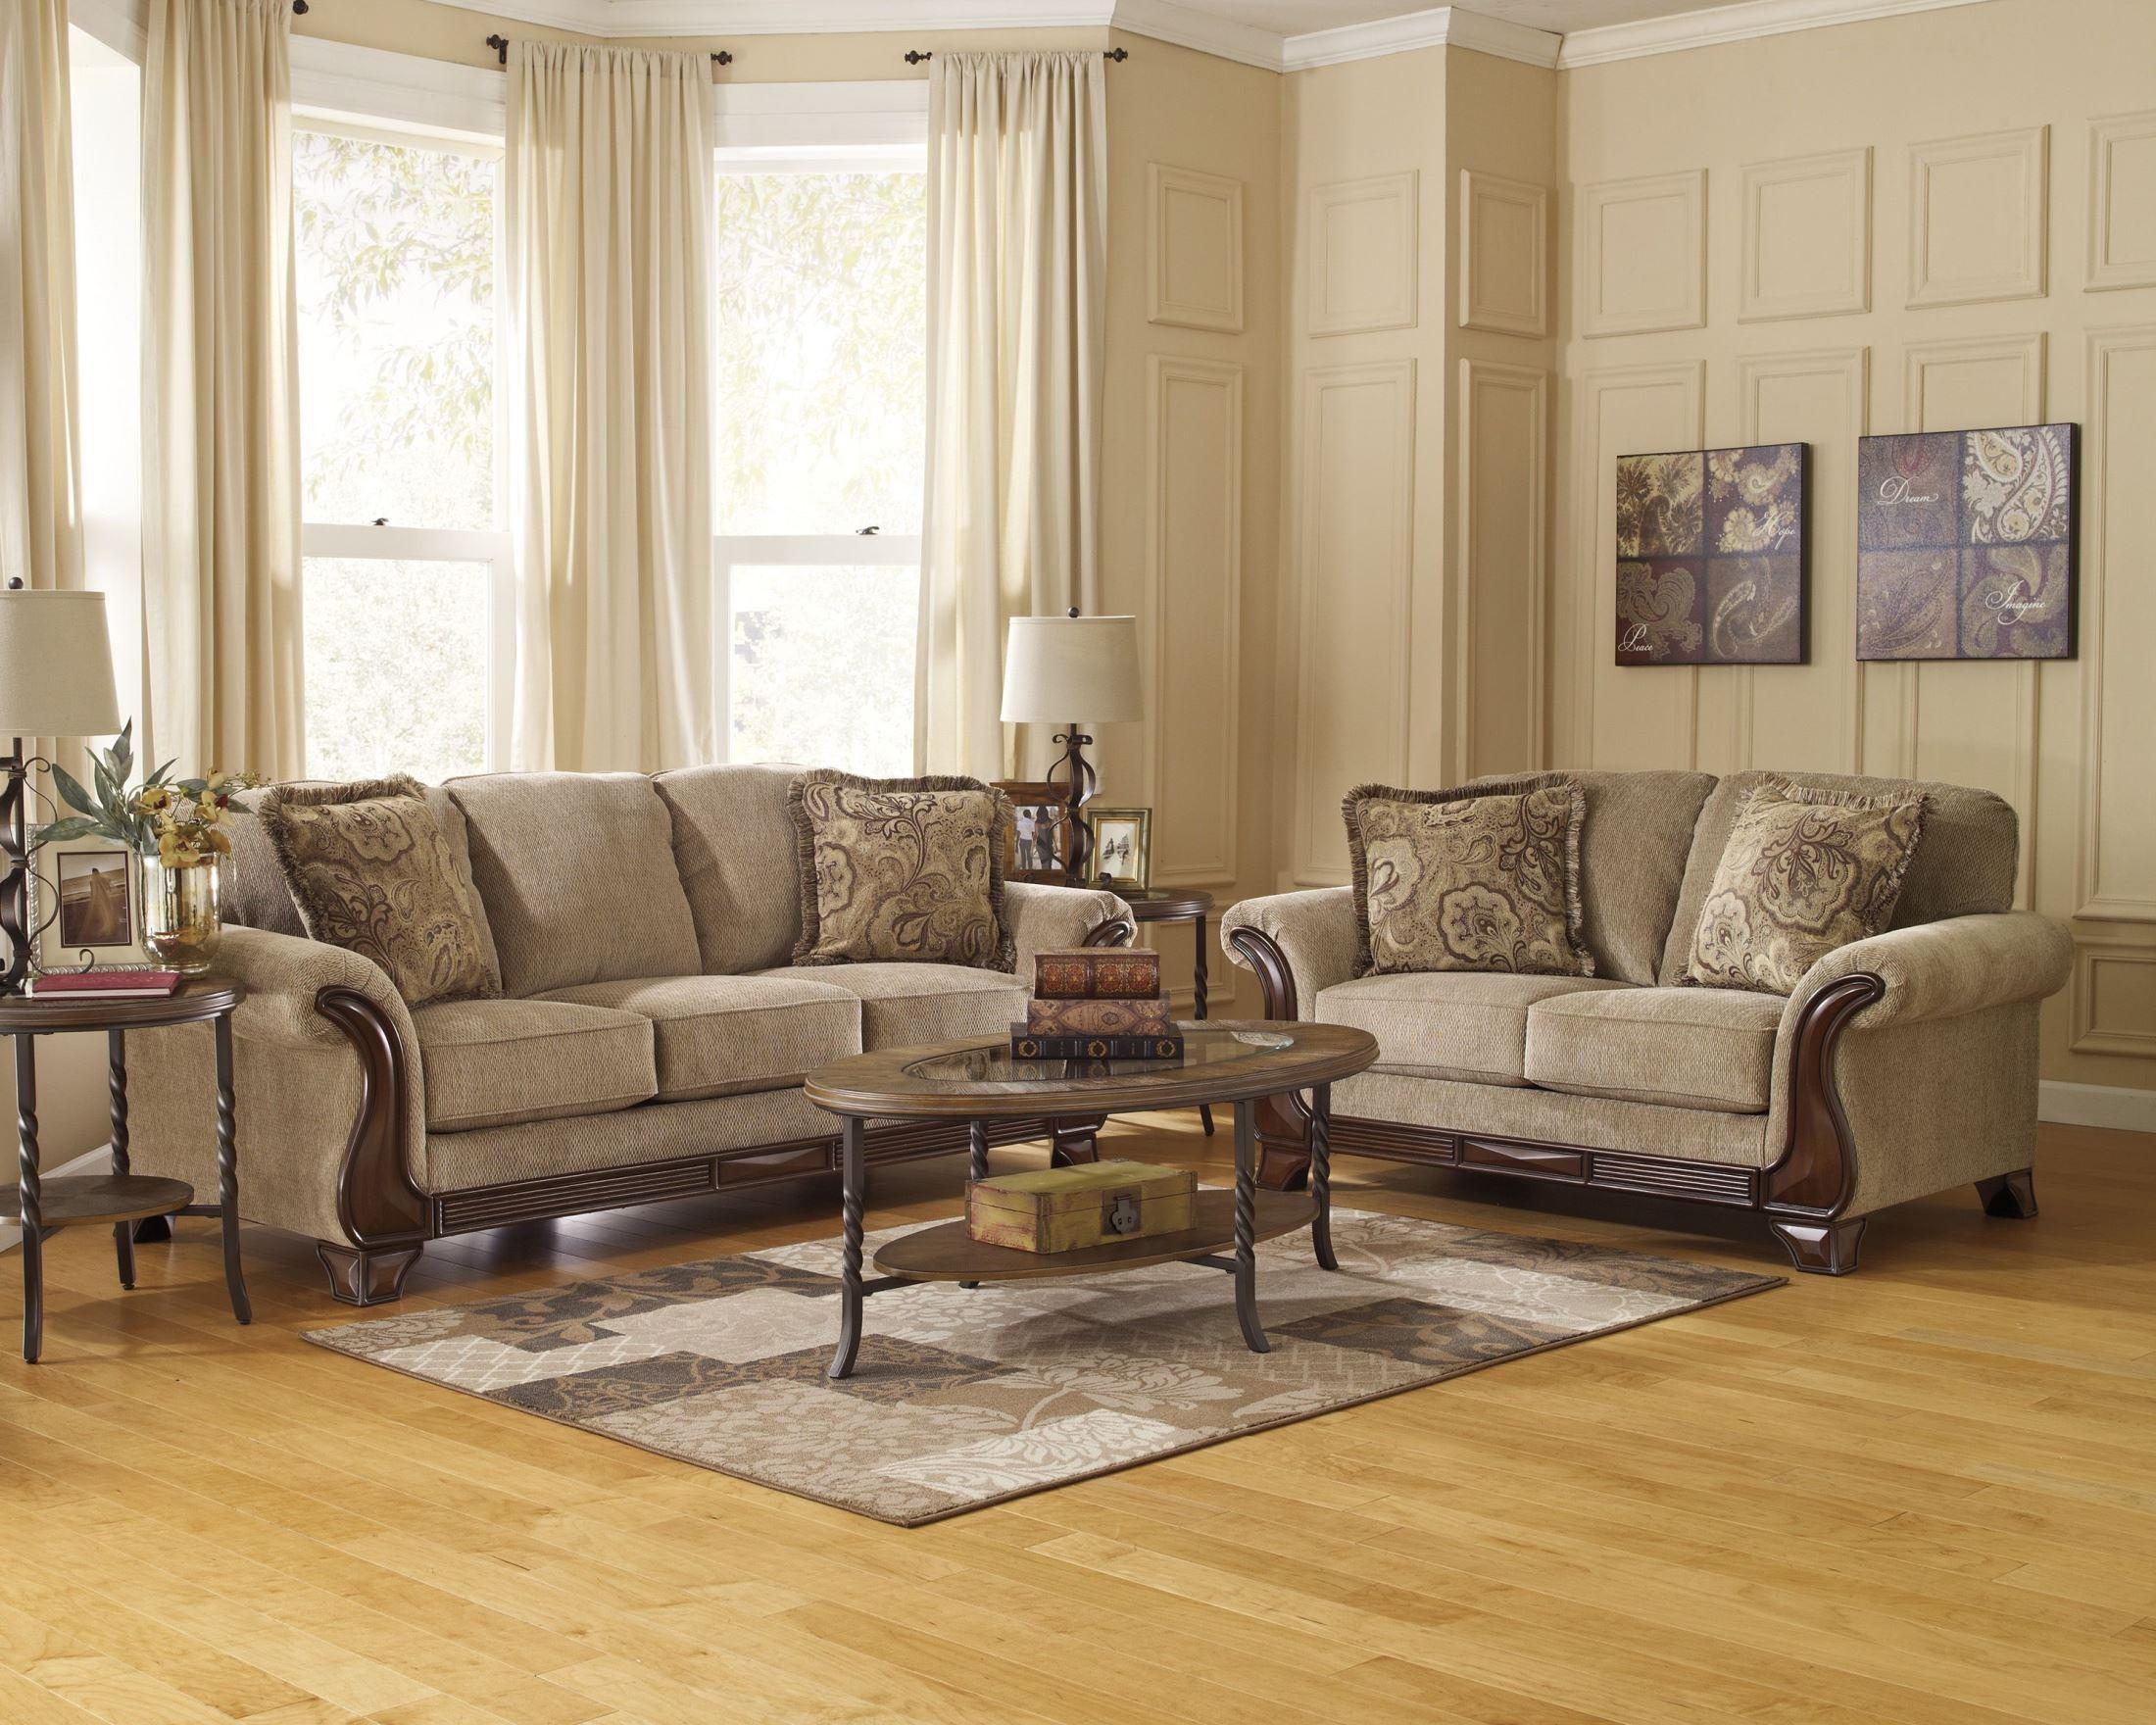 Living Room Furniture Sets: Lanett Living Room Set From Ashley (4490038)